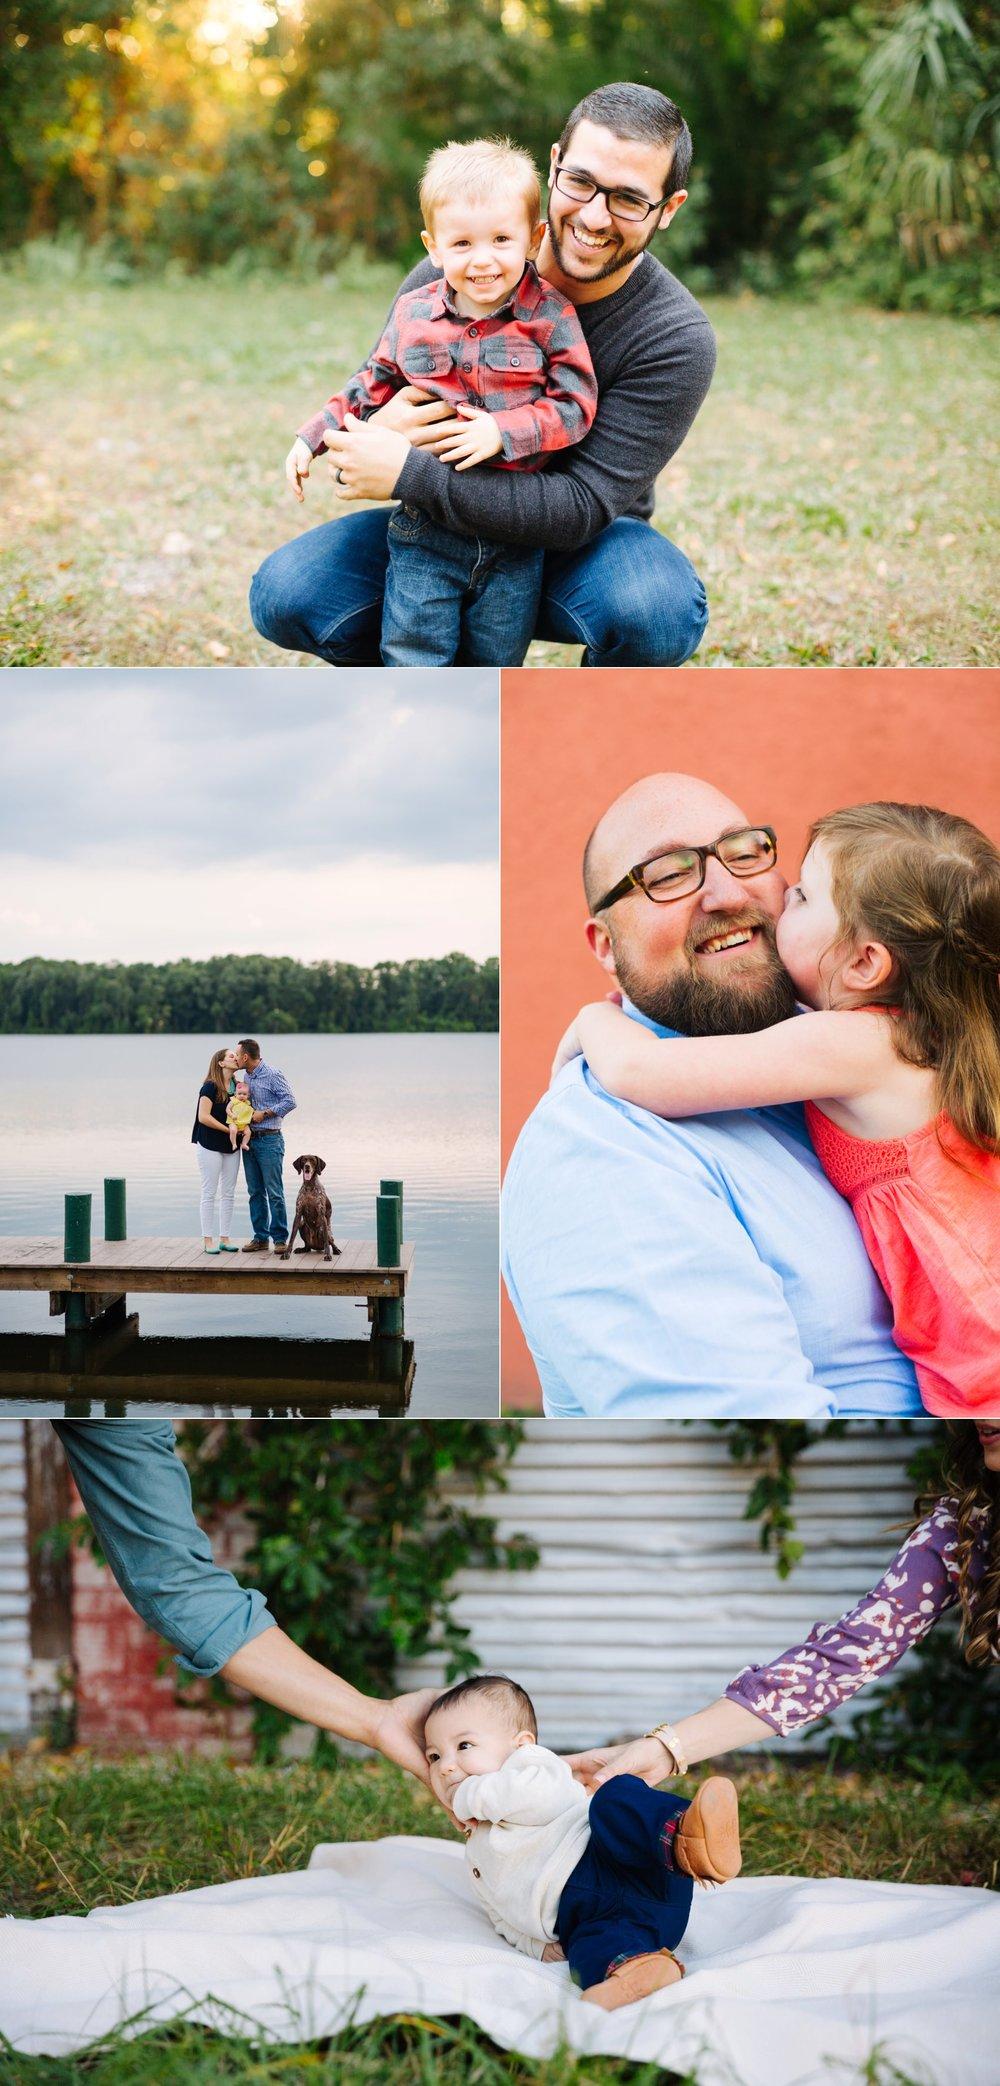 Jake & Katie's Best of Families 2016-009.jpg